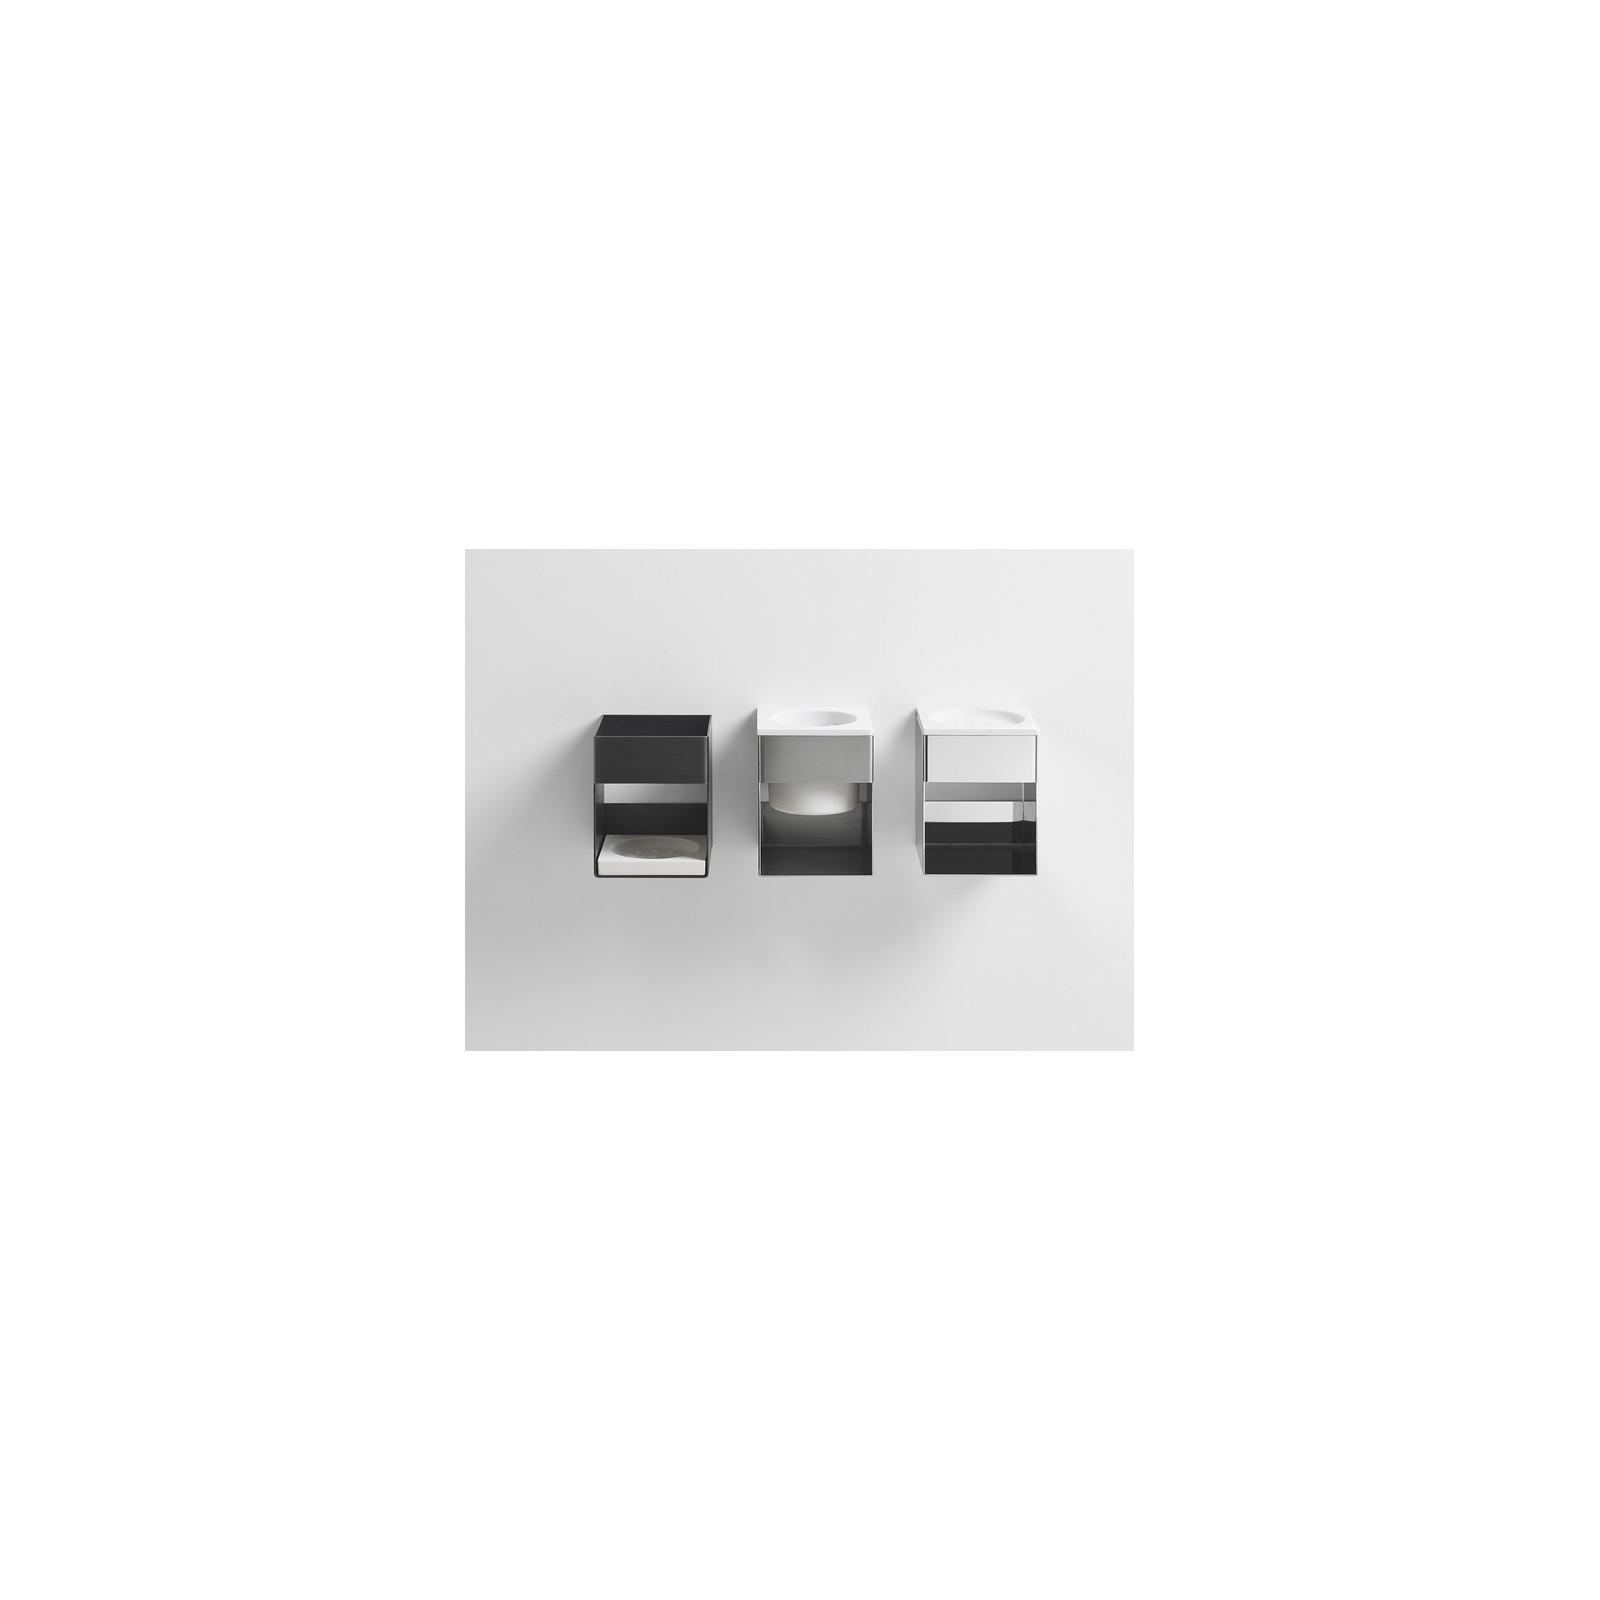 Mensole in acciaio 369  by Agape - Contecom